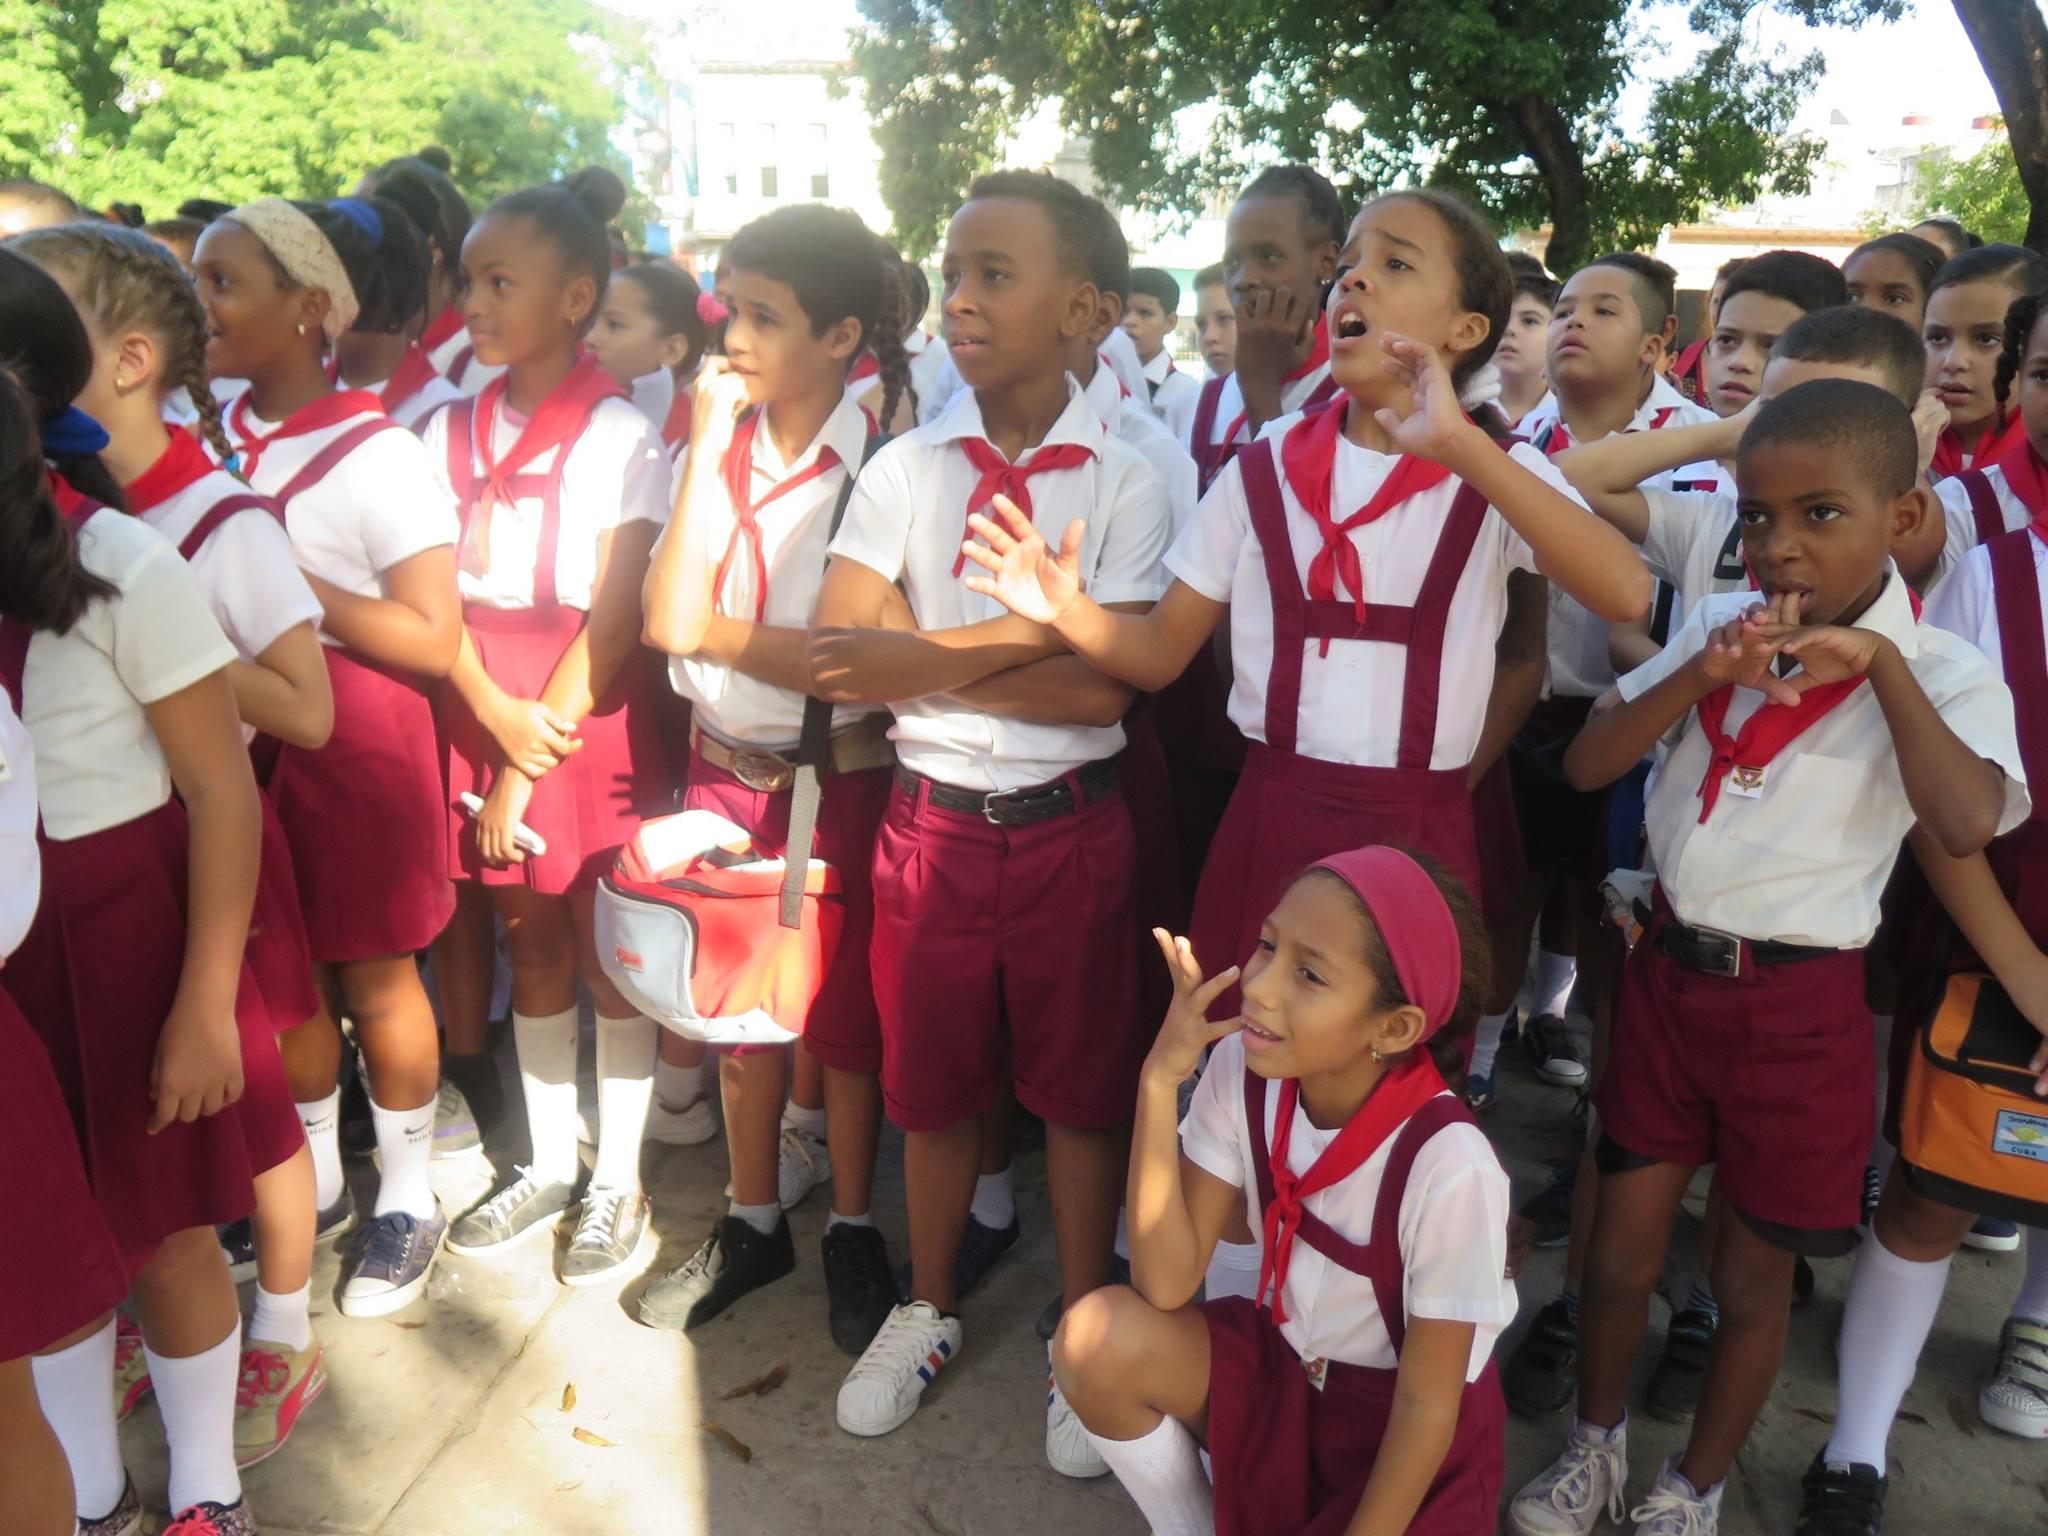 Cuba,havana,cuba havana,caribbean,island,latin,latin america,havana cuba,men,chess,men playing chess,havana street,street,streetlife, children, students, class, children's class,